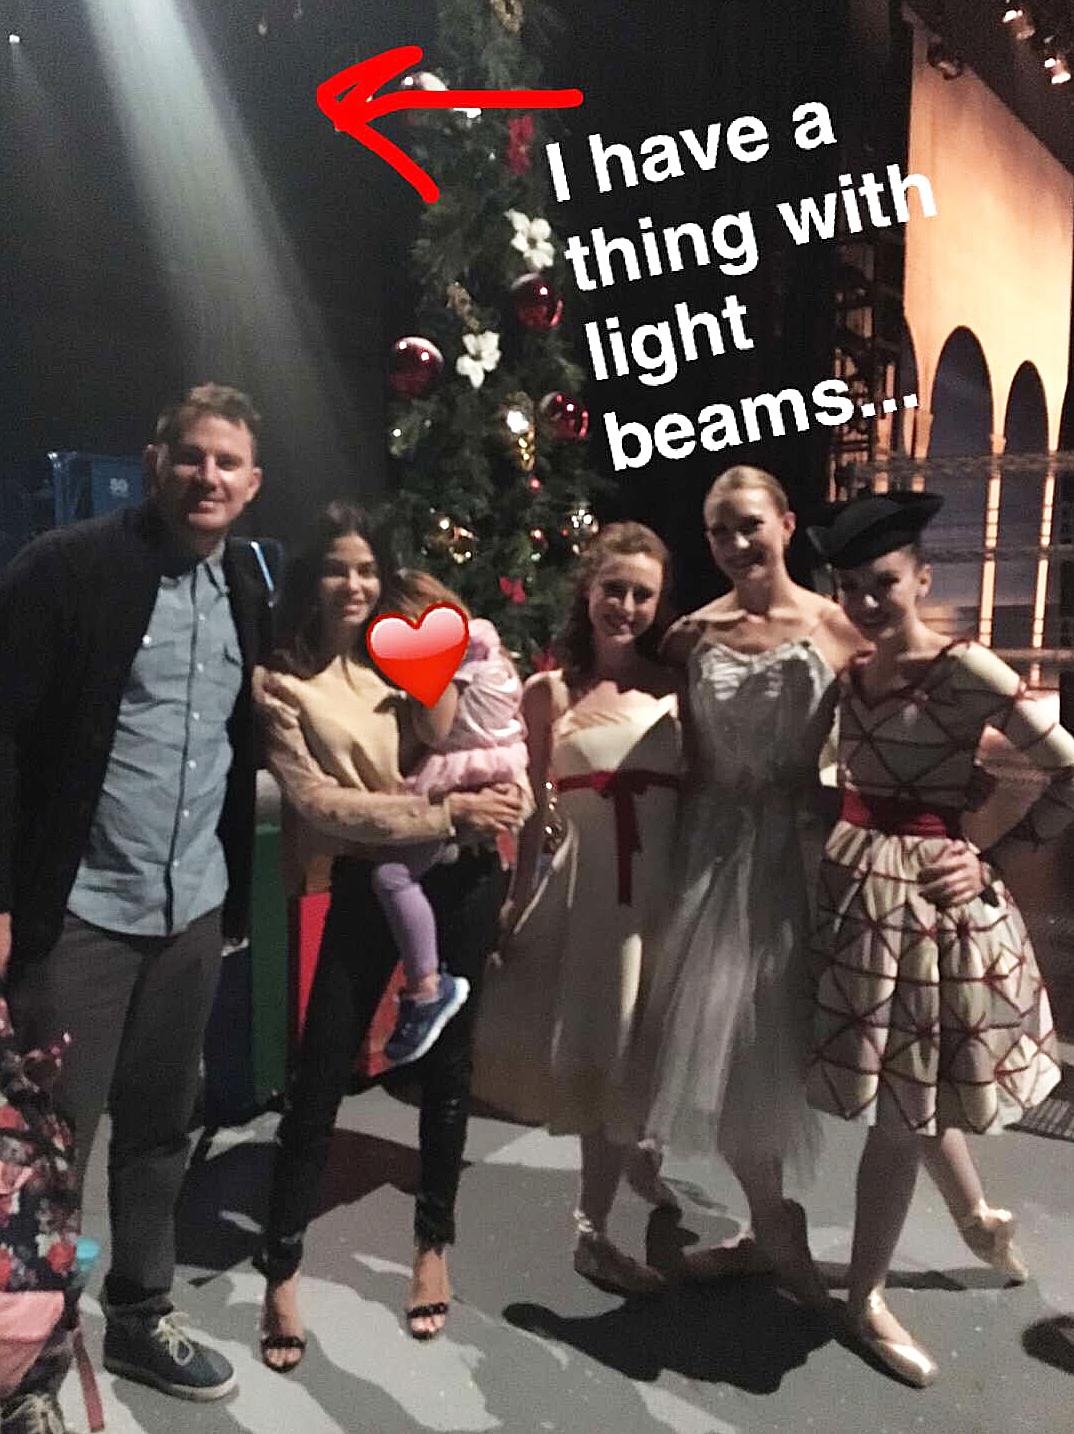 Channing Tatum Jenna Dewan Everly Snapchat